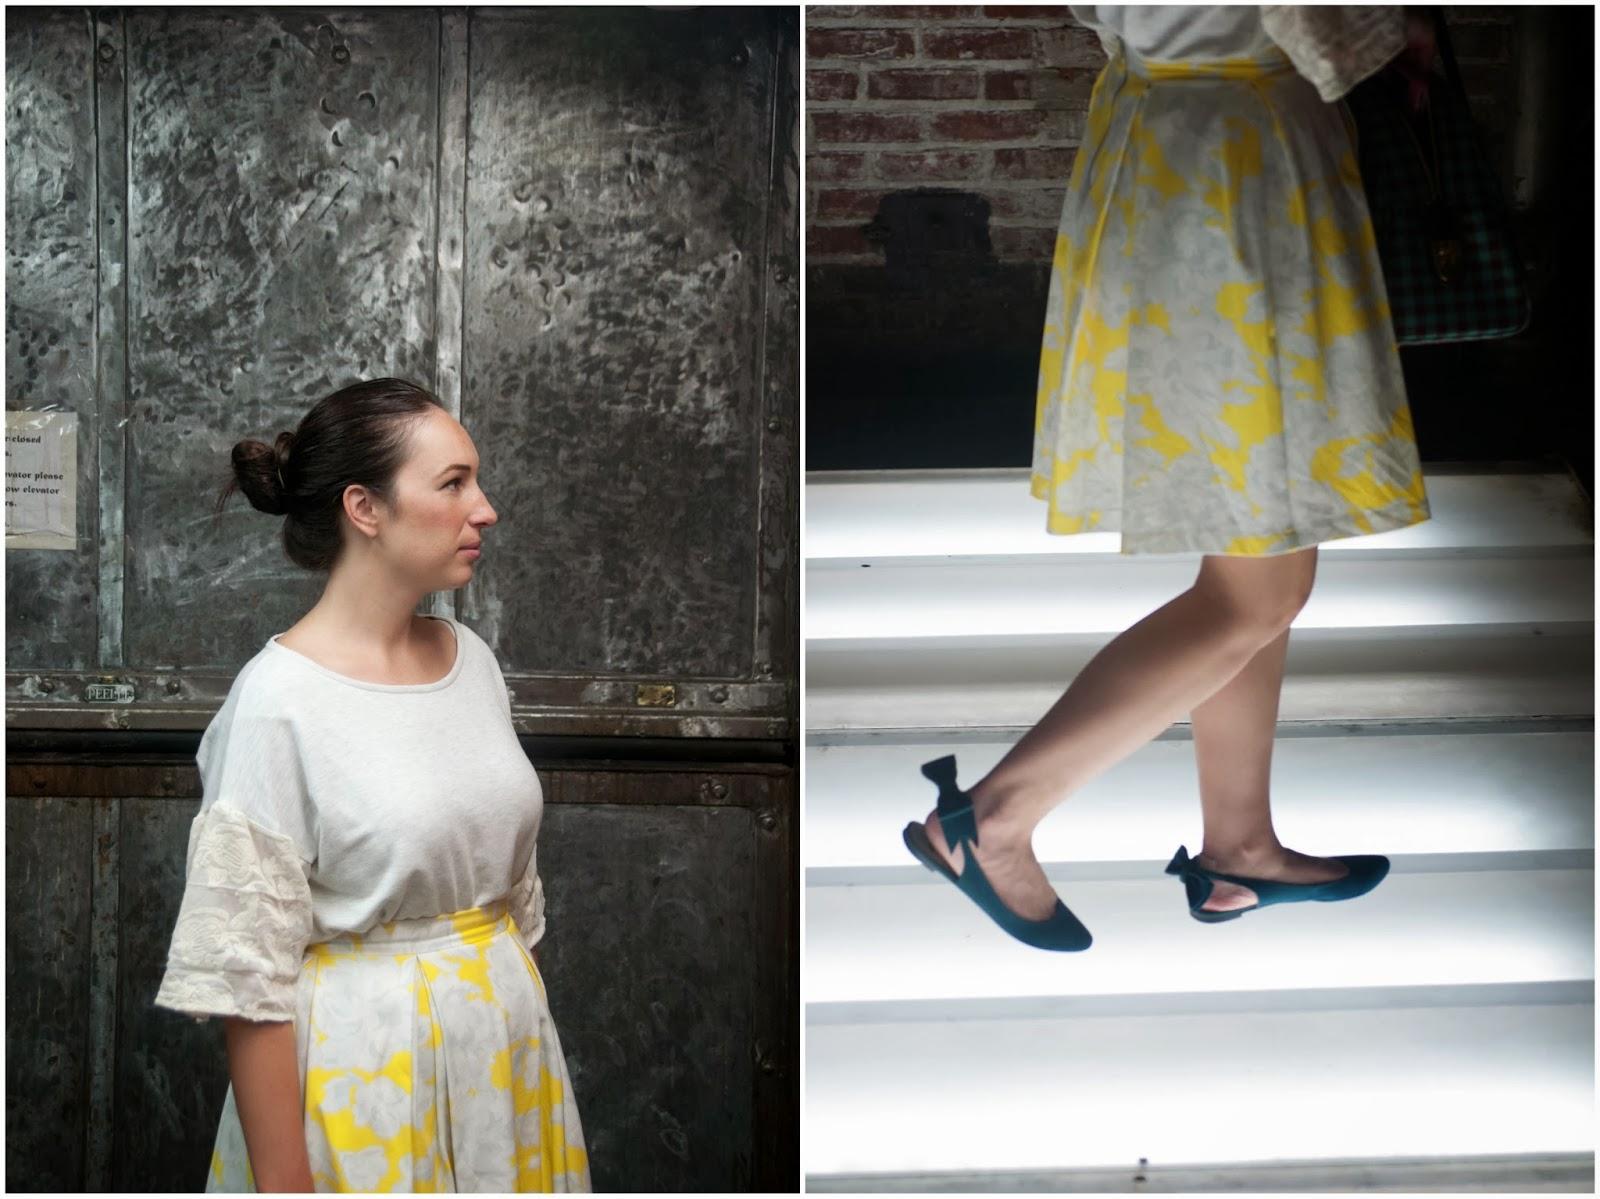 fashion blog, style blog, ootd, anthropologie ootd blog, his and her fashion, his and her style